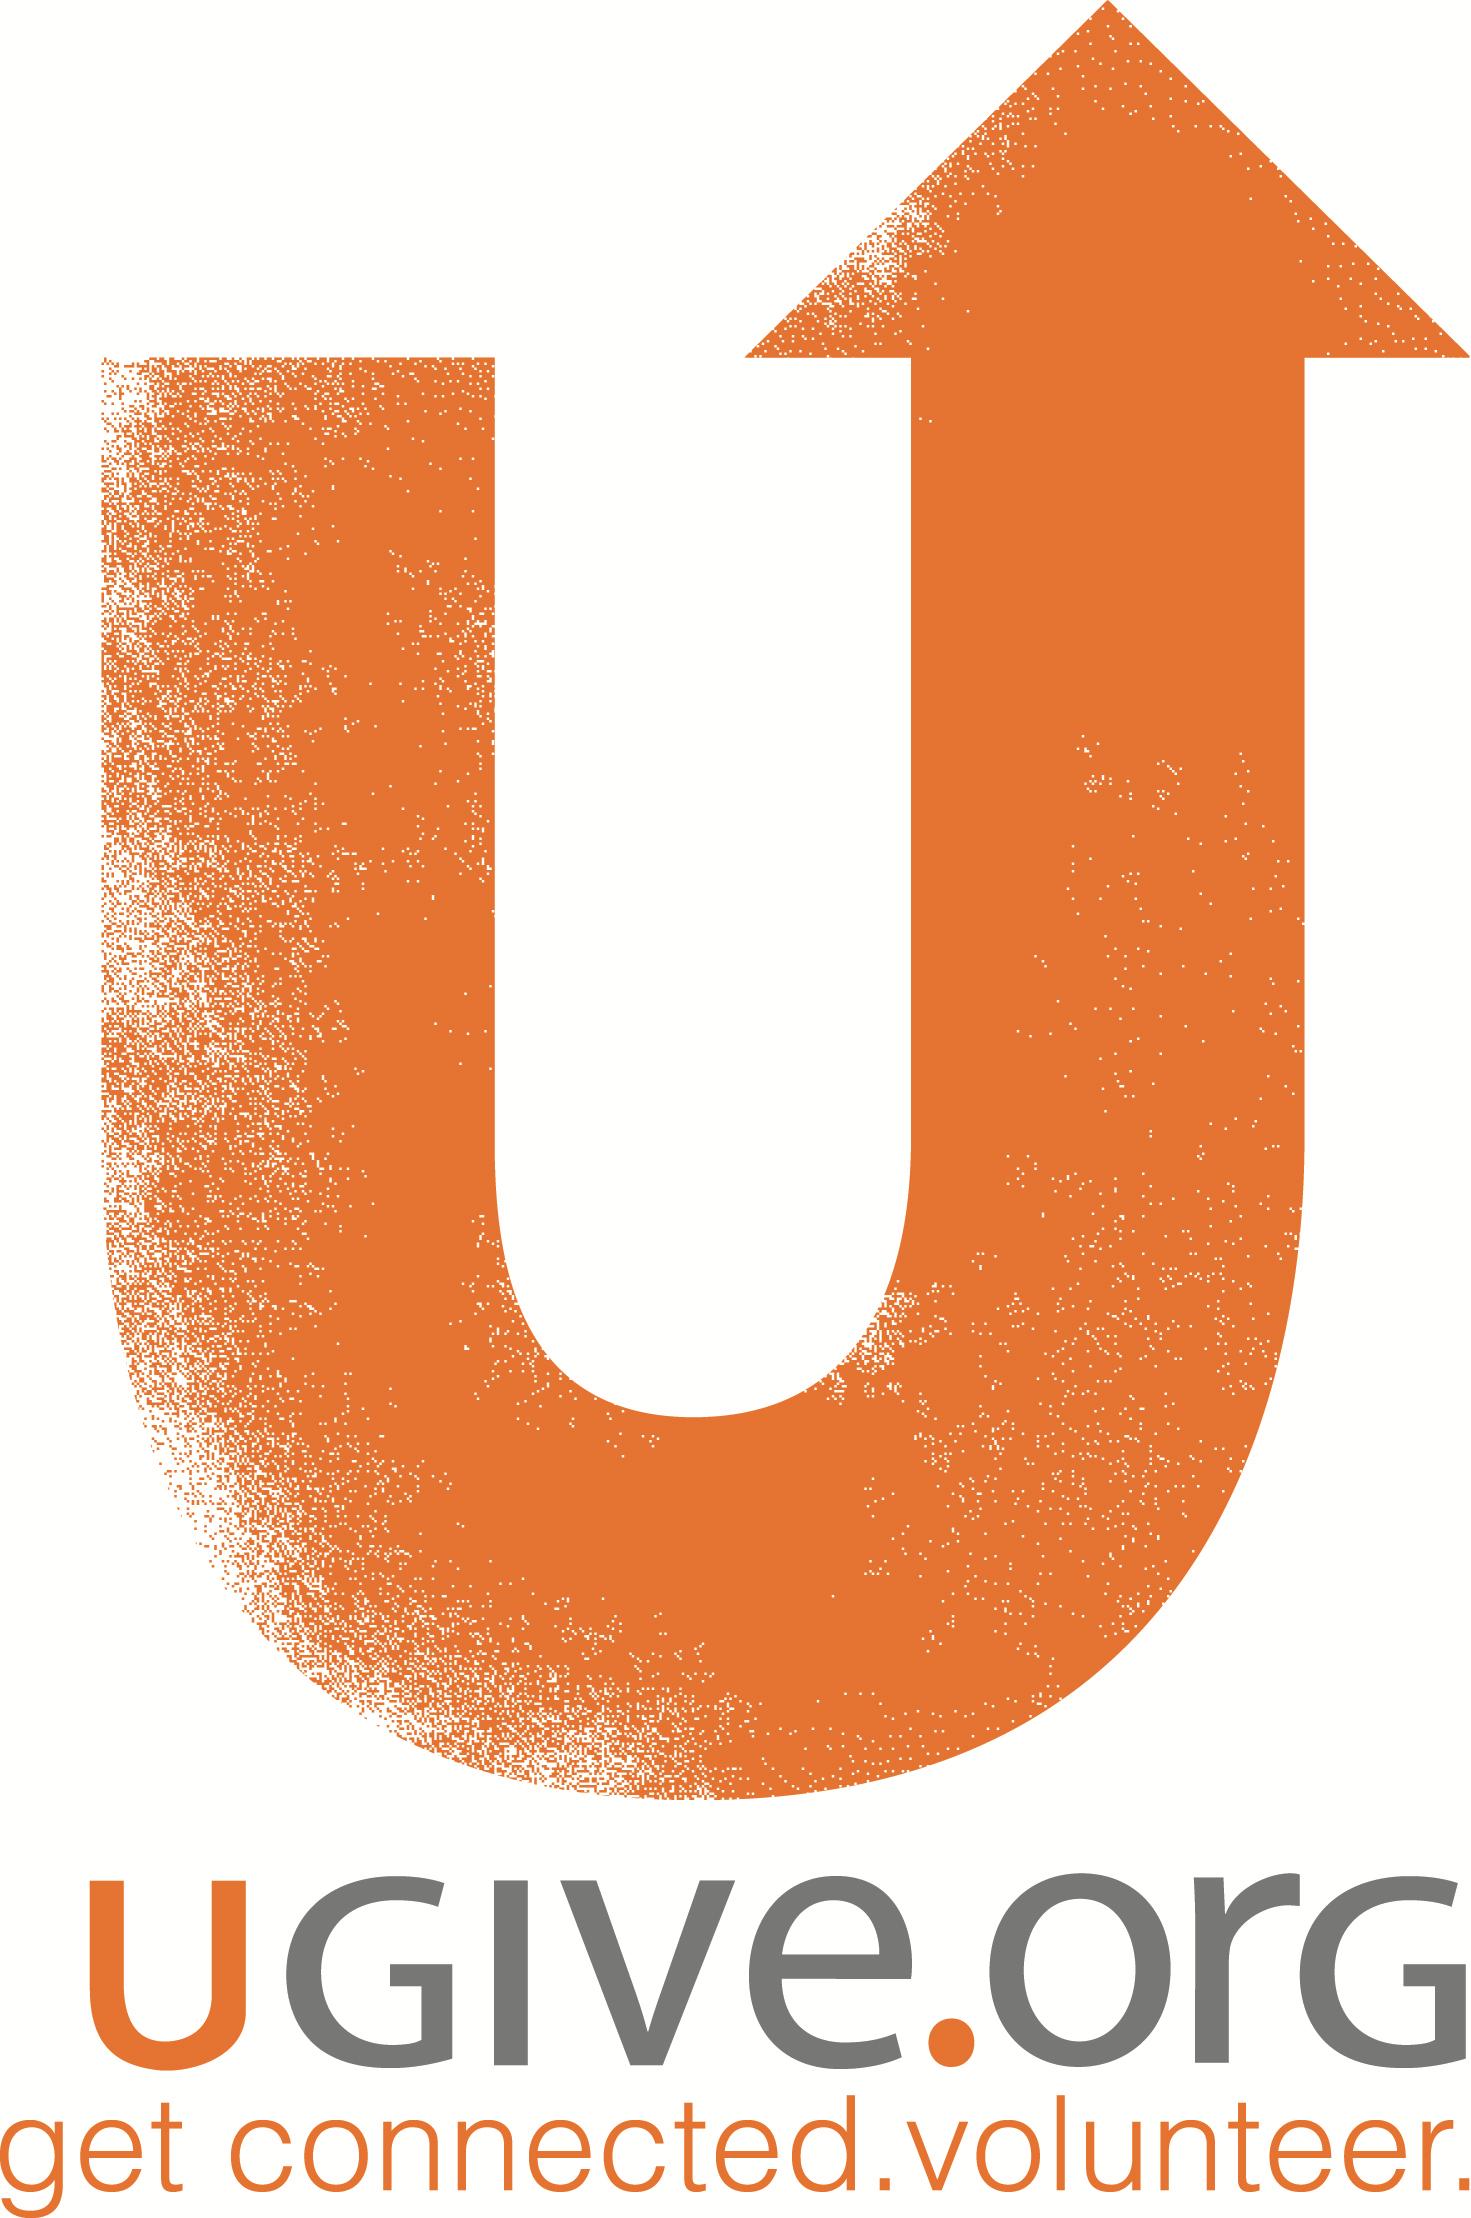 UGIVE.org